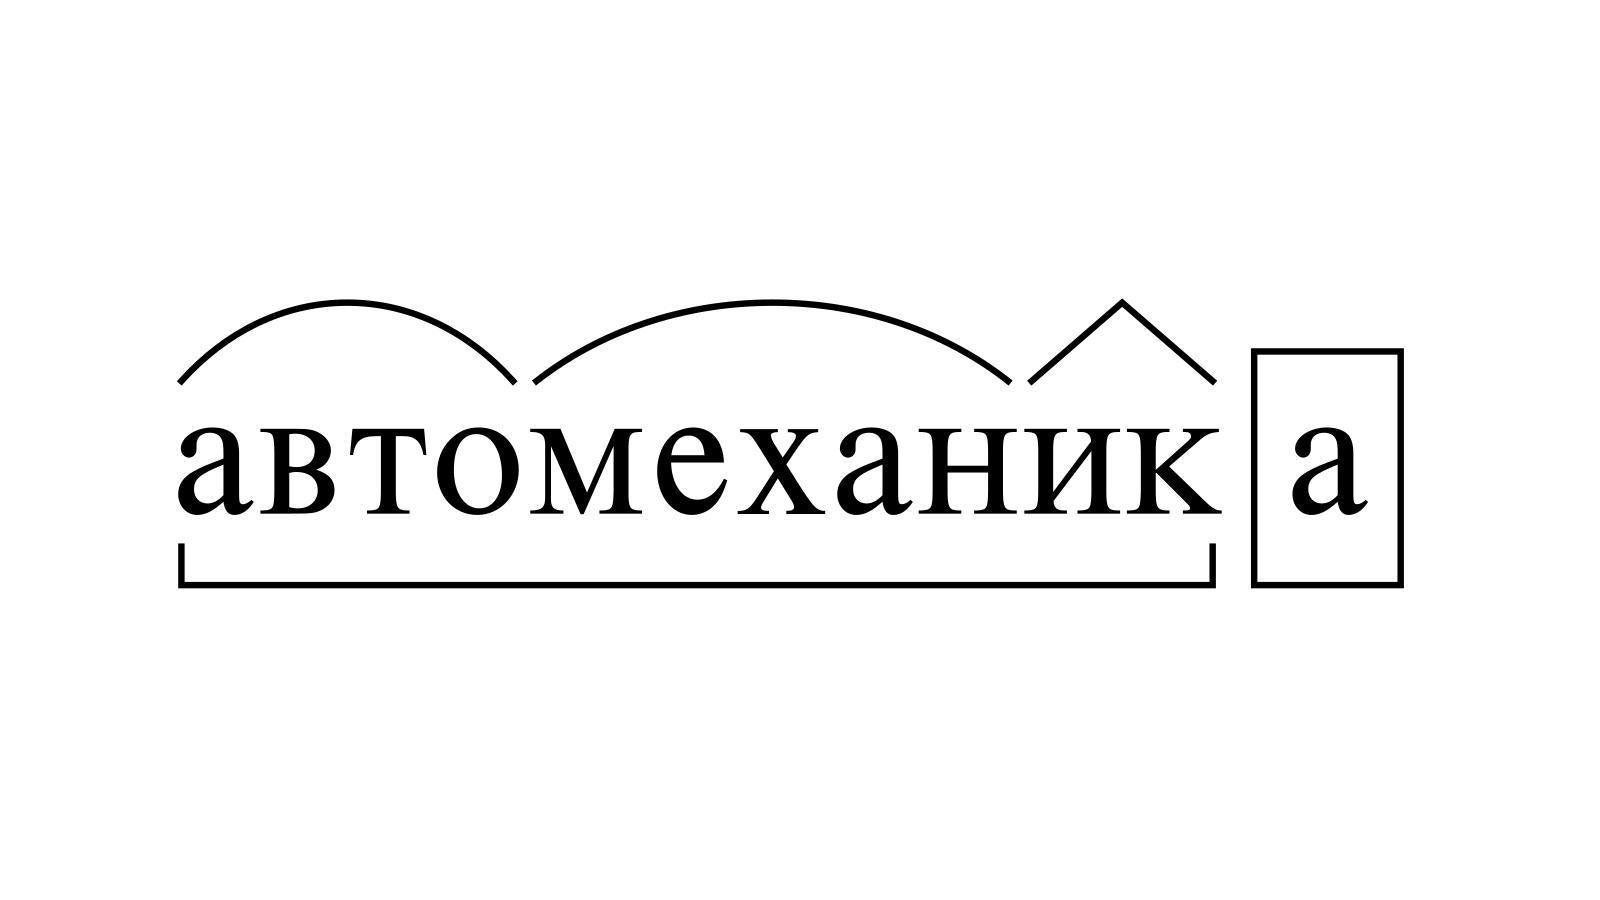 Разбор слова «автомеханика» по составу